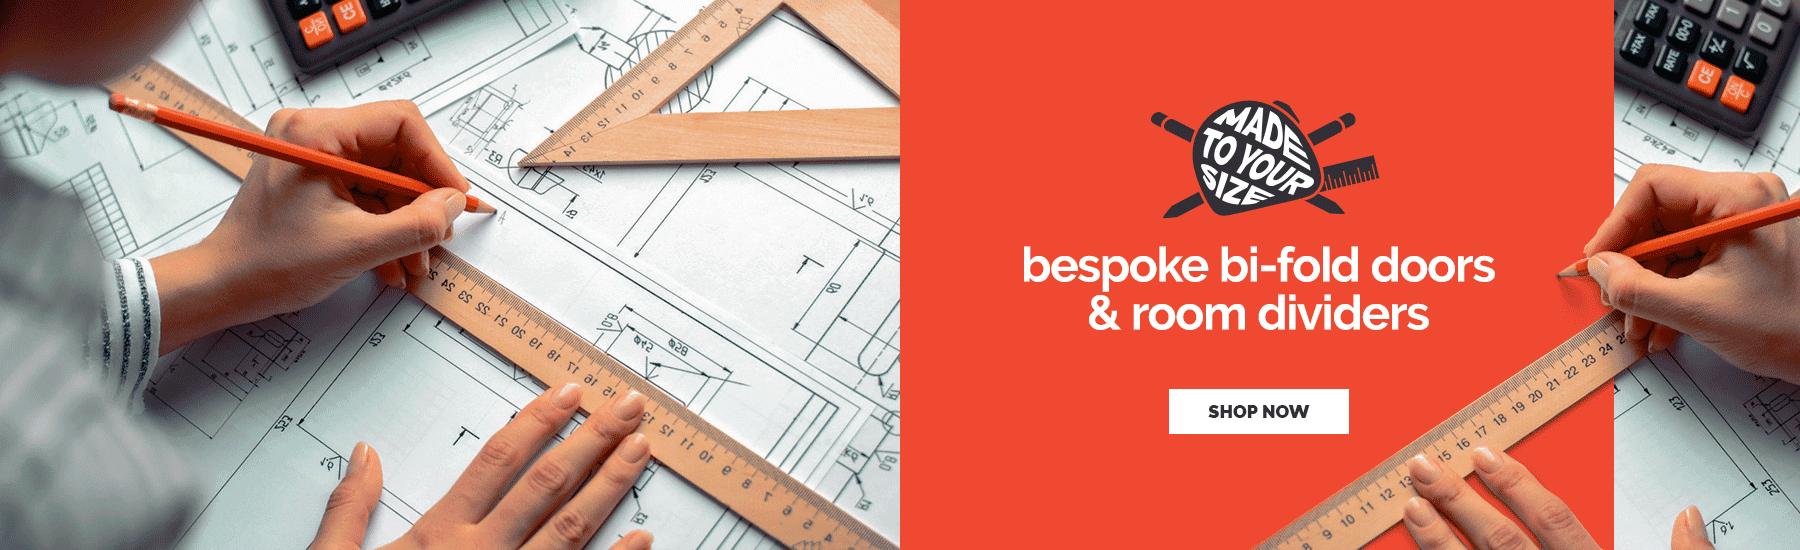 July - Bespoke bi-fold doors and room dividers